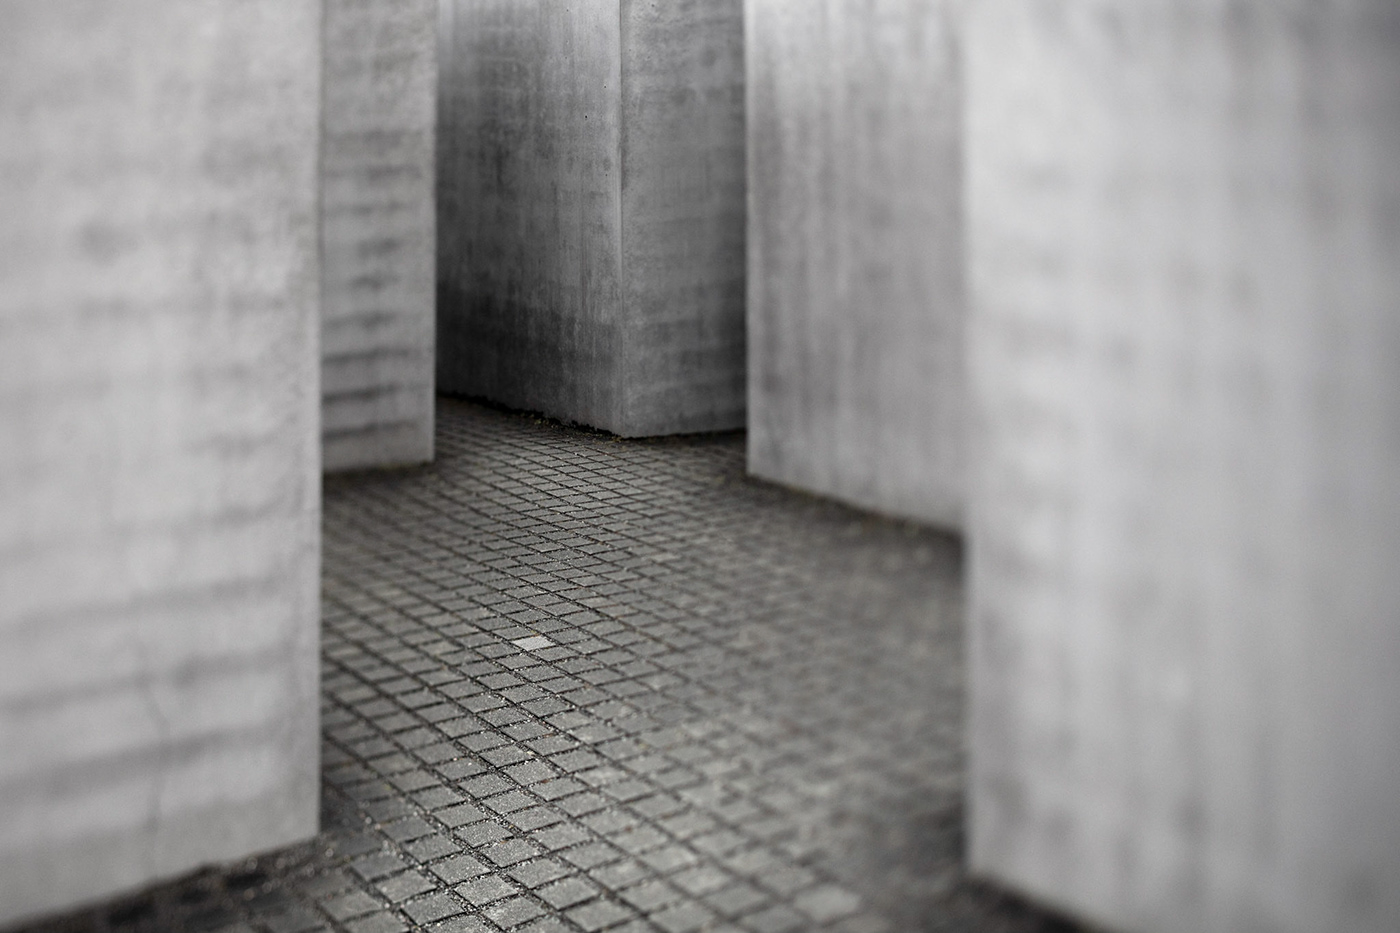 berlin Victory Column Tiergarden Kulturen der Welt Marie-Elisabeth-Lüders-Haus Memorial-to-the-Murdered-Jews-of-Europe Berliner Fernsehturm St Thomas Chruch germany carillon